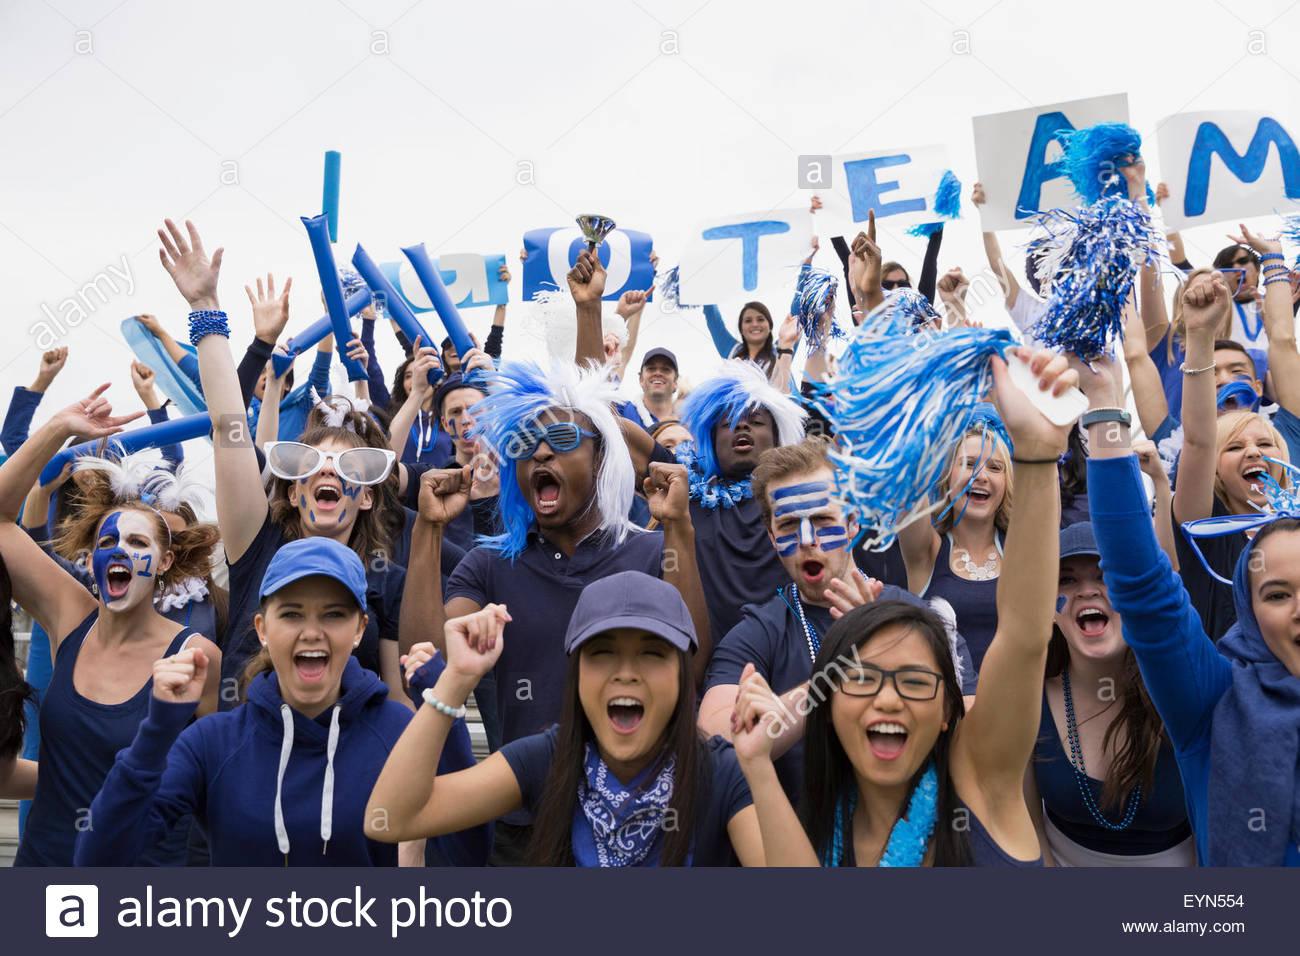 Retrato entusiasta multitud en azul vítores evento deportivo Imagen De Stock